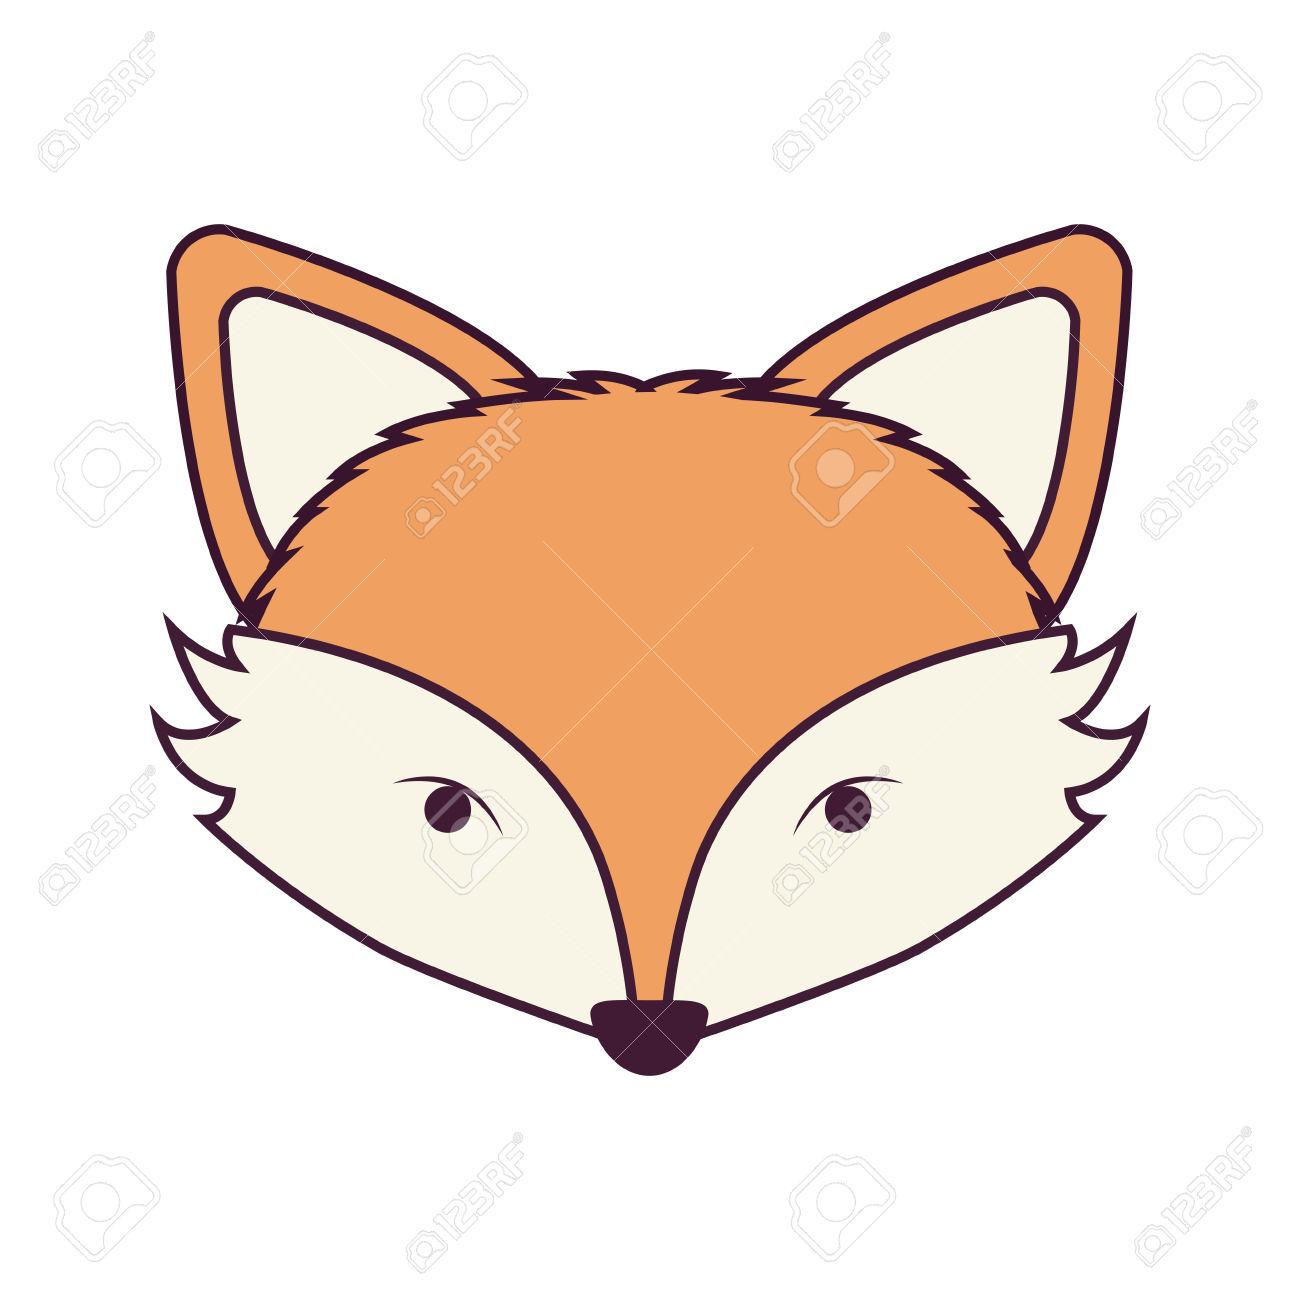 Fox Face Clipart.